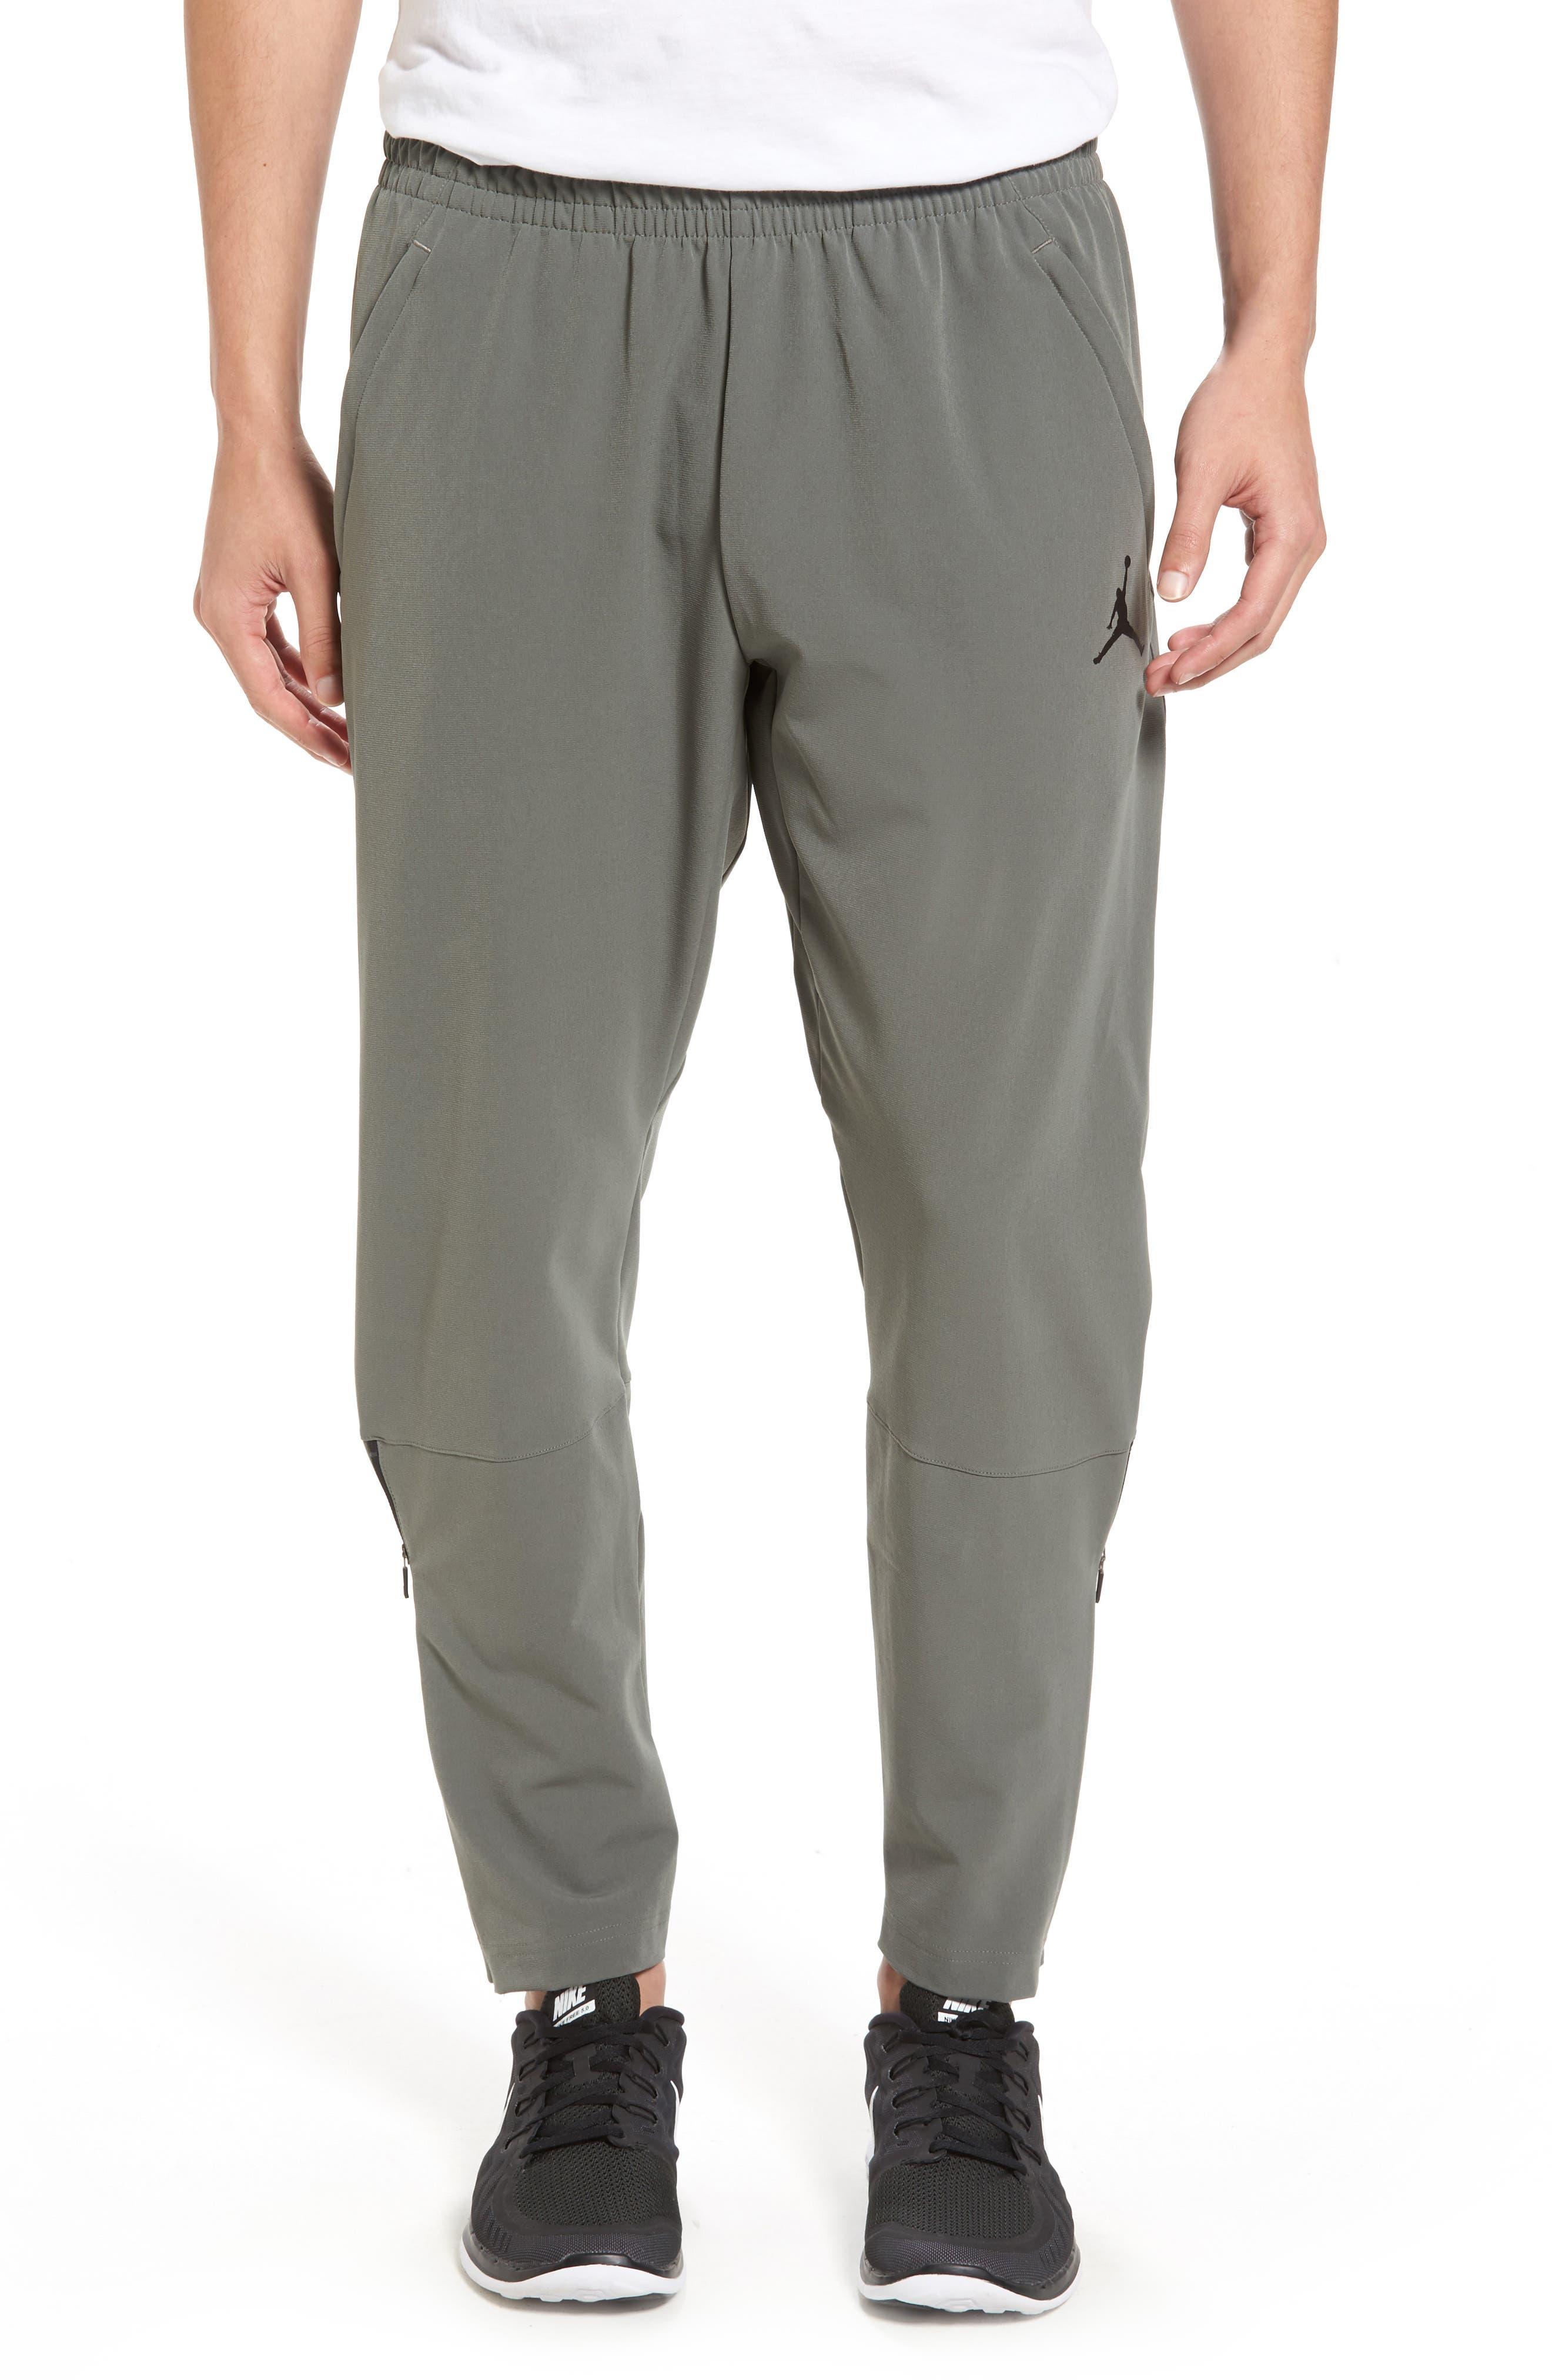 Alternate Image 1 Selected - Nike Jordan 23 Tech Shield Pants